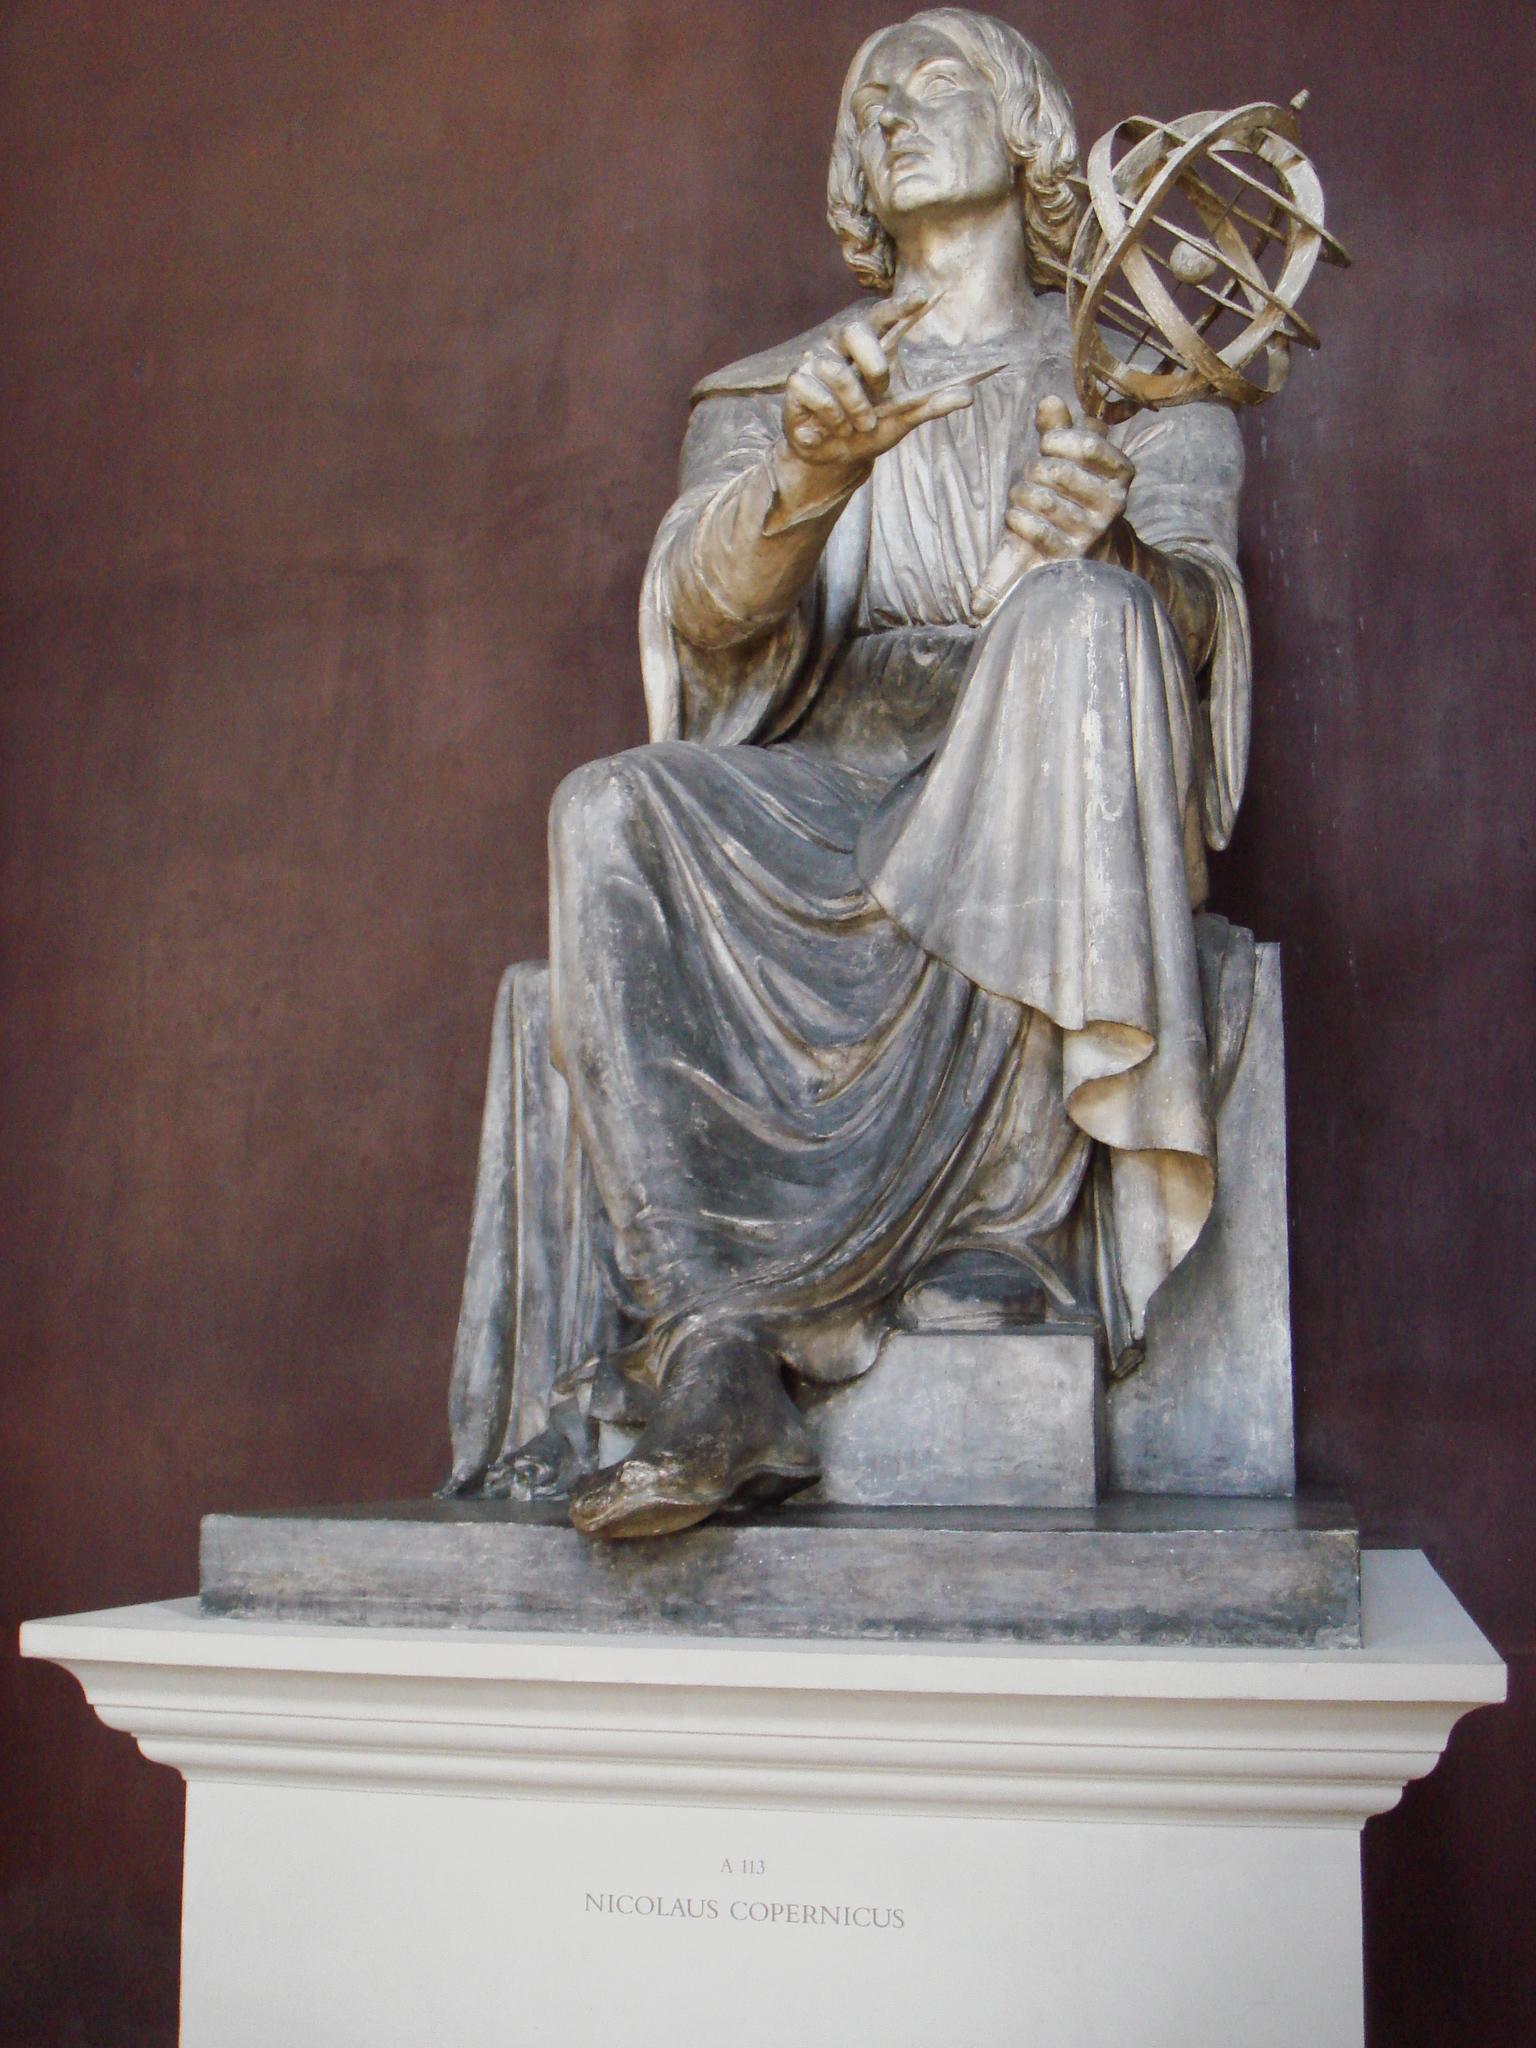 est100 一些攝影(some photos): Nicolaus Copernicus,哥白尼